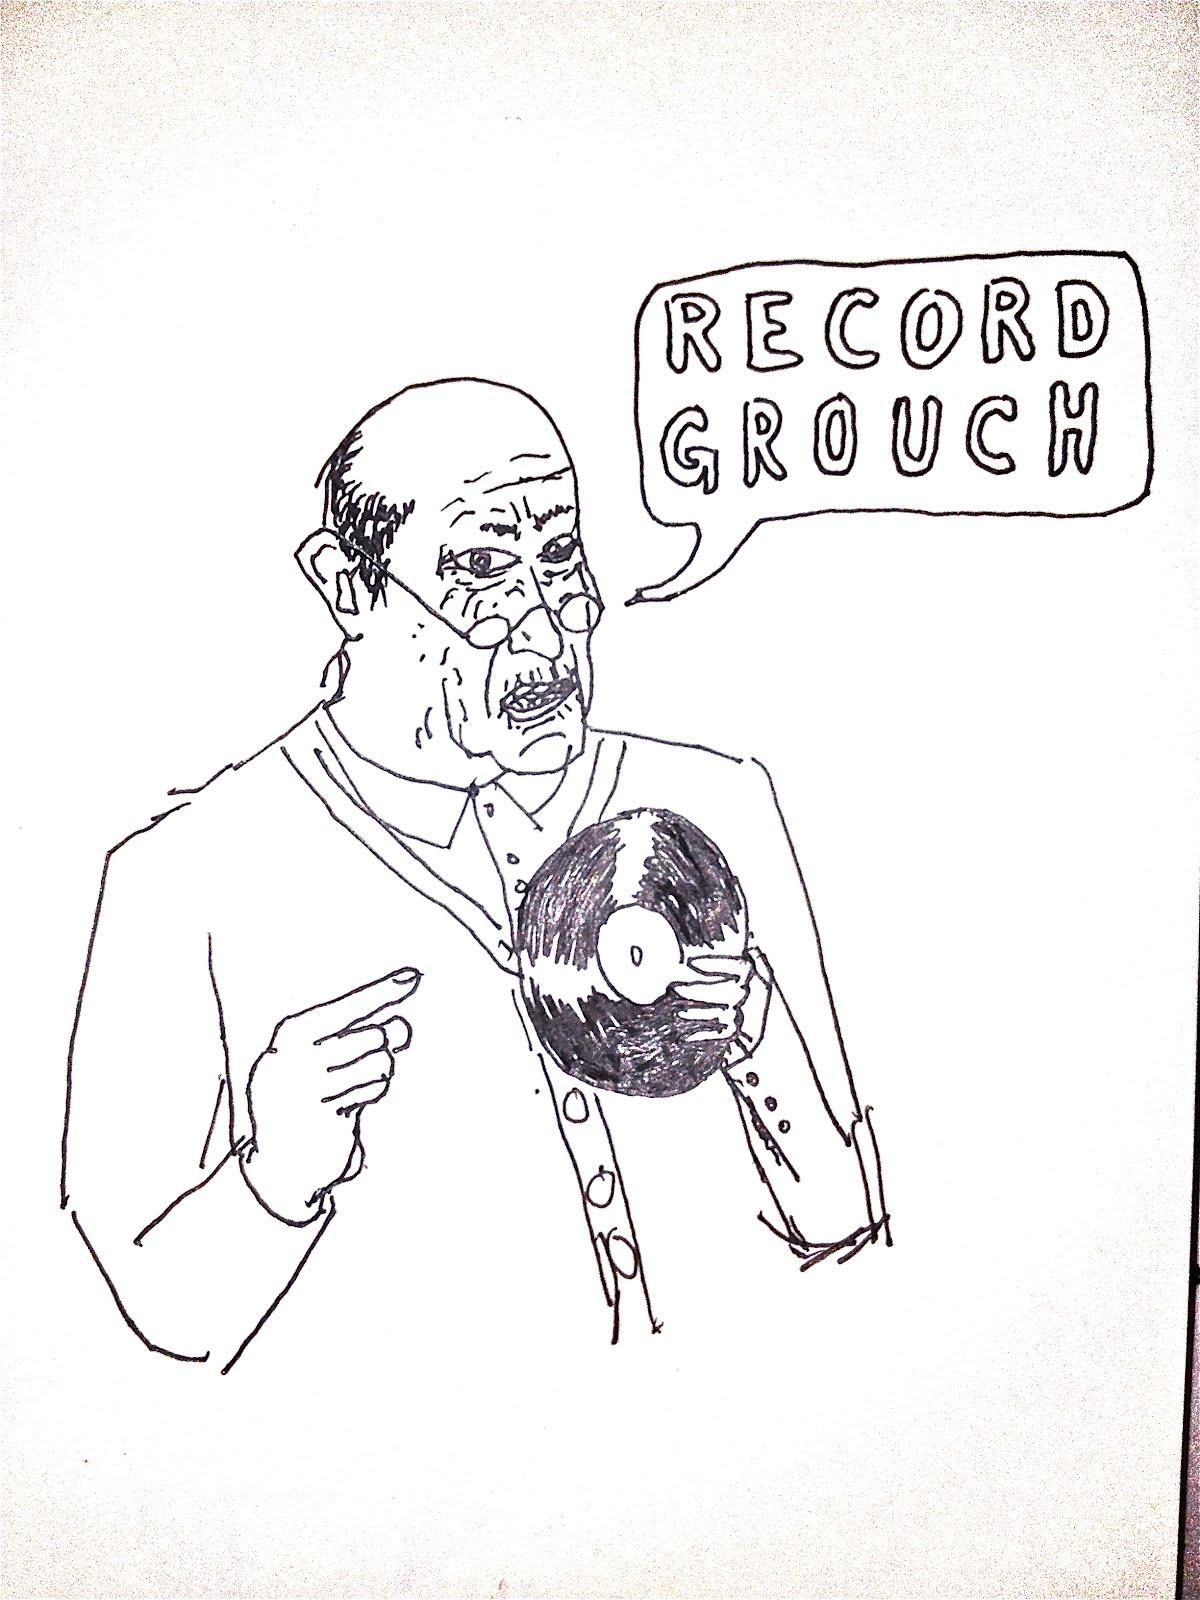 RecordGrouch.jpg